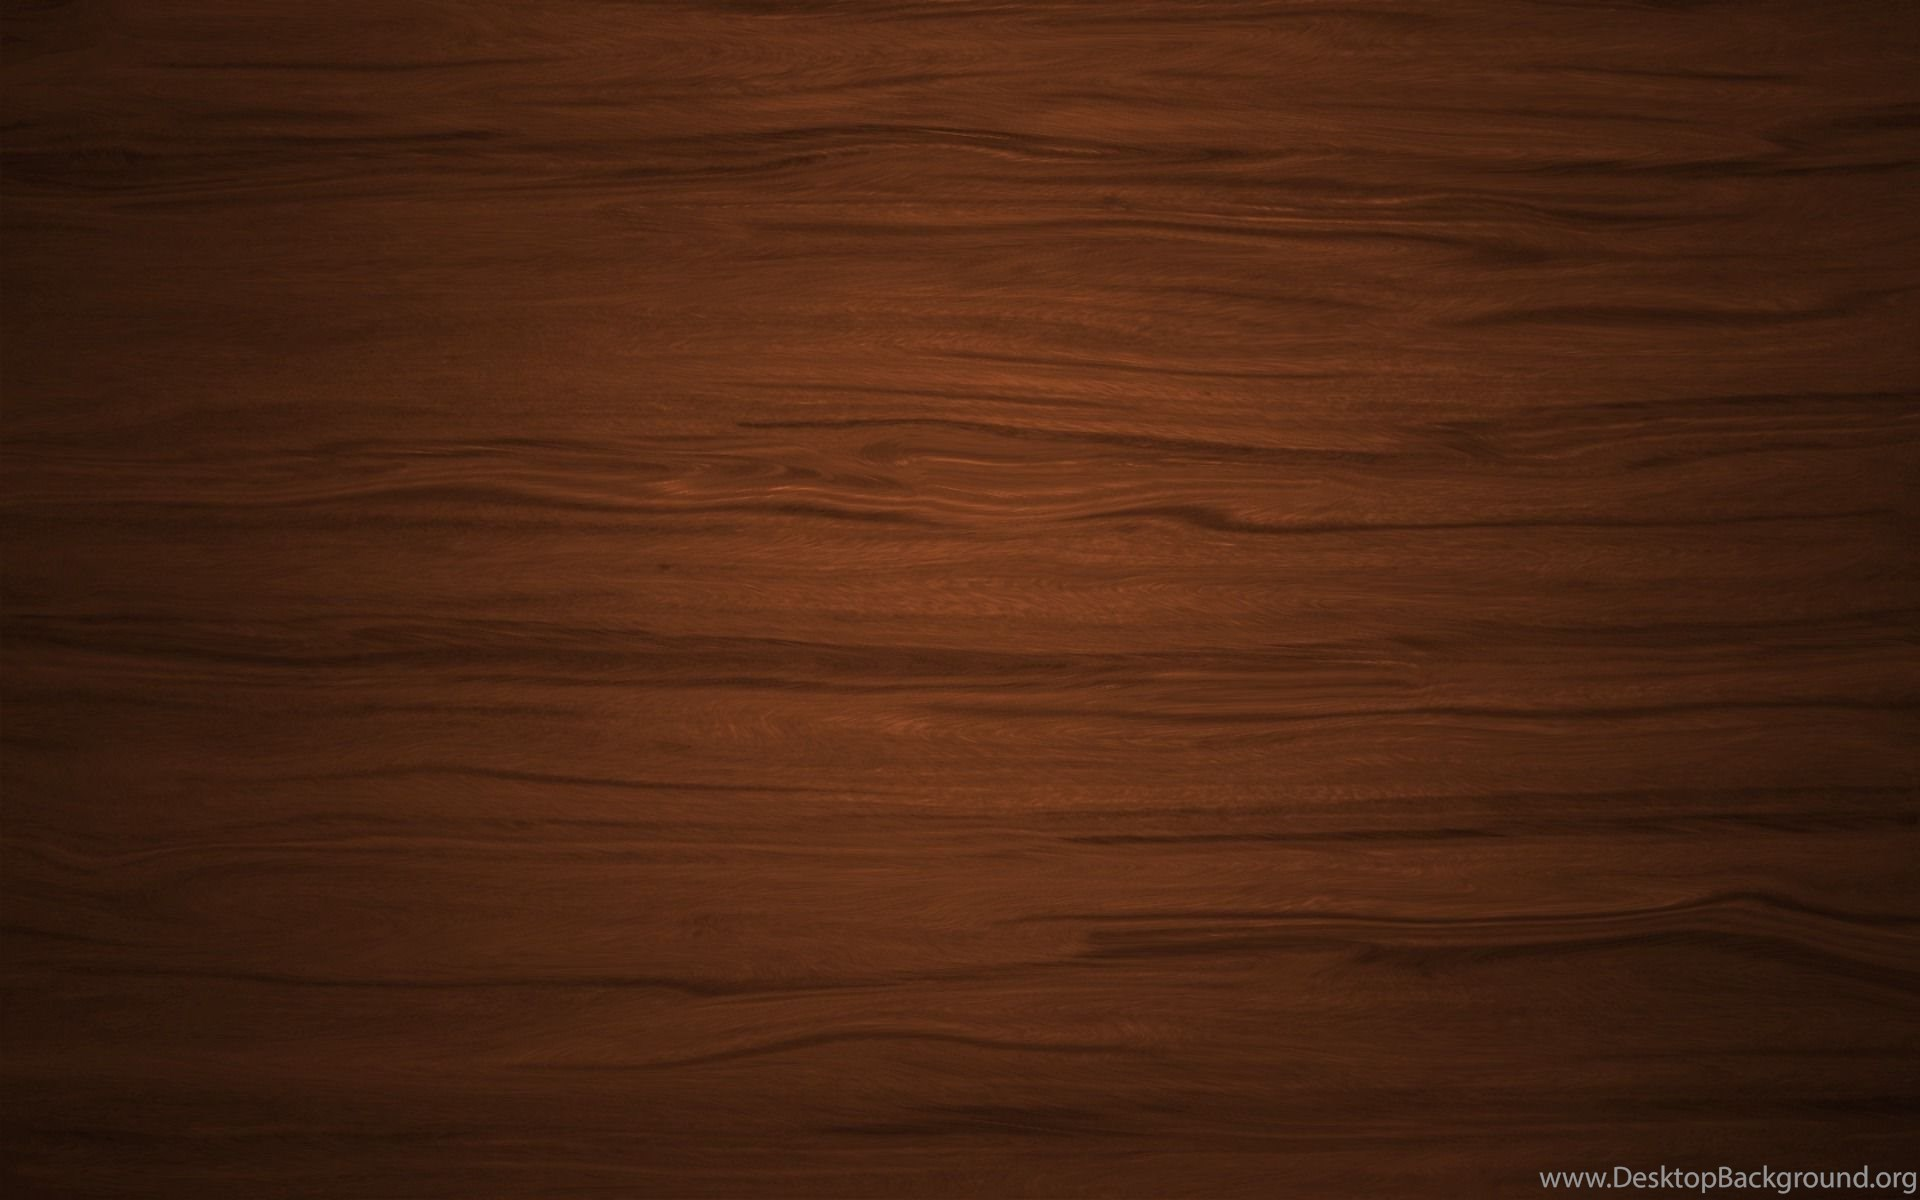 wooden texture hd desktop background